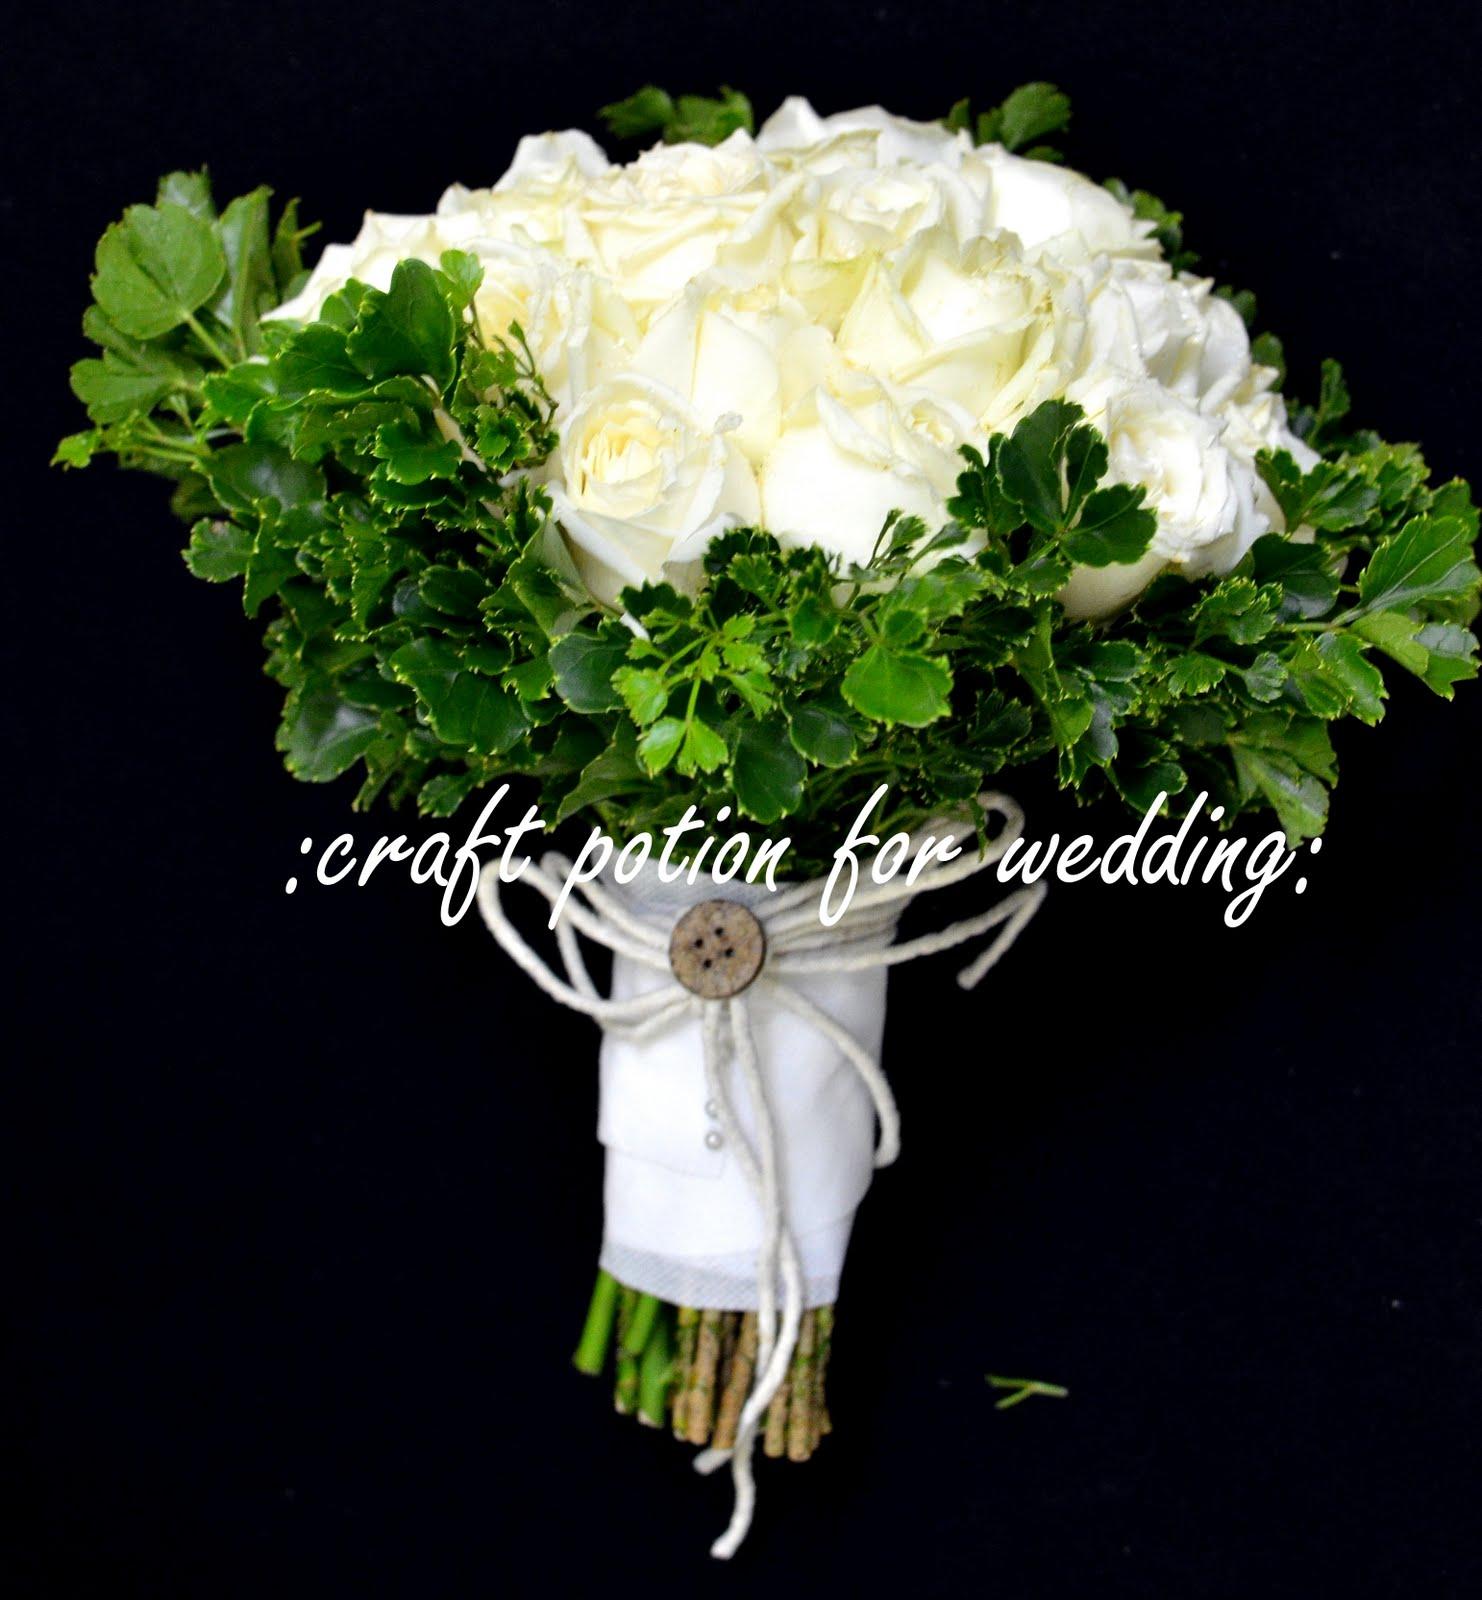 The craft potion handbouquet fresh flowers garden wedding handbouquet fresh flowers garden wedding izmirmasajfo